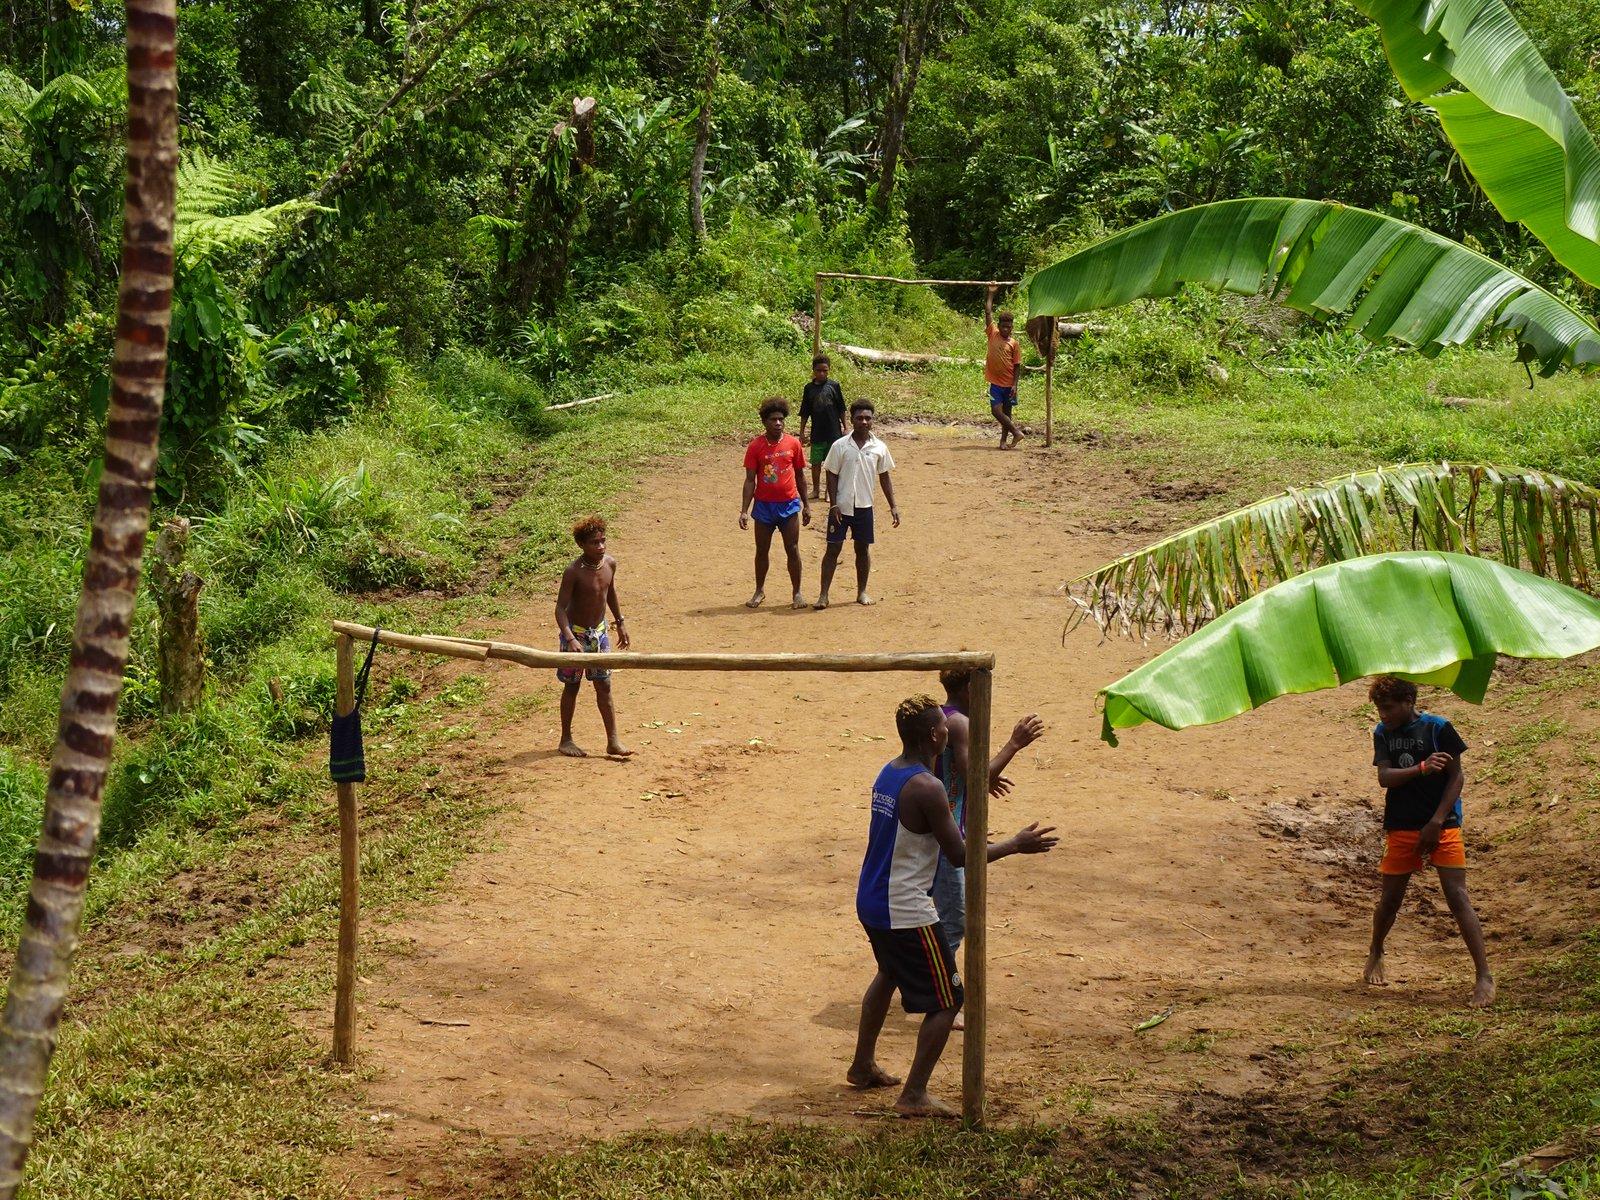 The Kwaio playing sport, Malaita, Solomon Islands